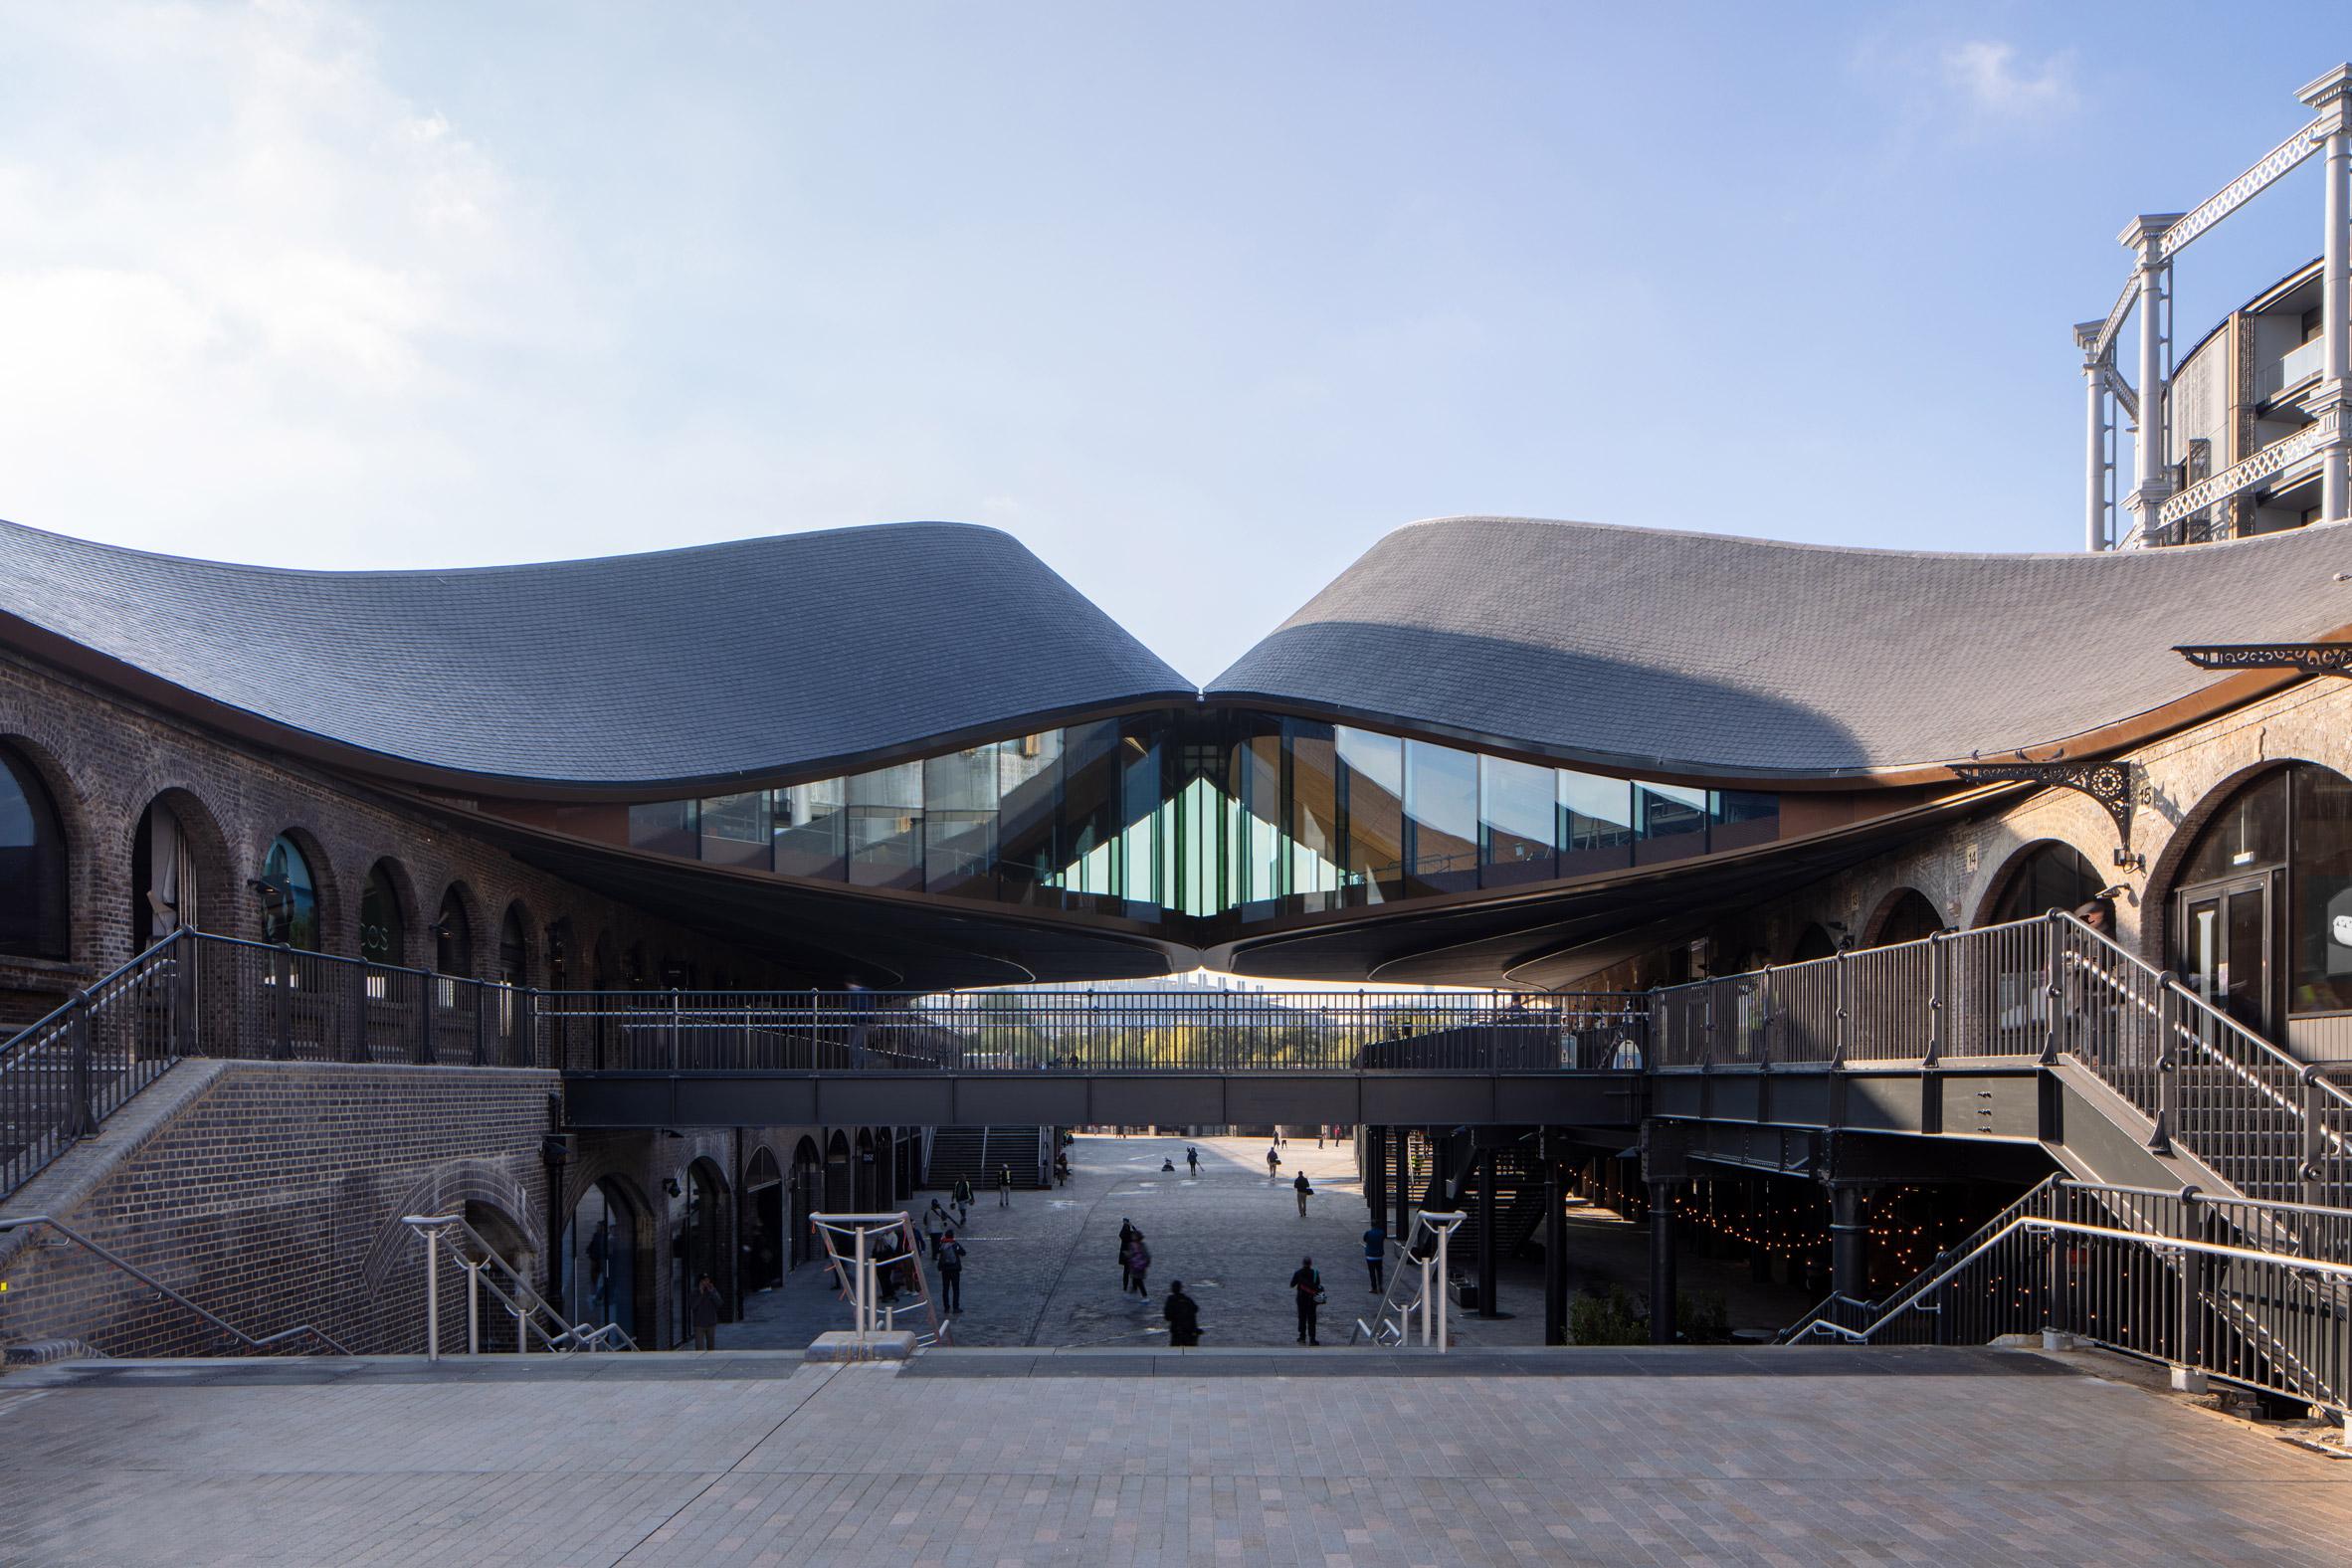 coal-drops-yard-thomas-heatherwick-studio-kings-cross-architecture_dezeen_2364_col_8